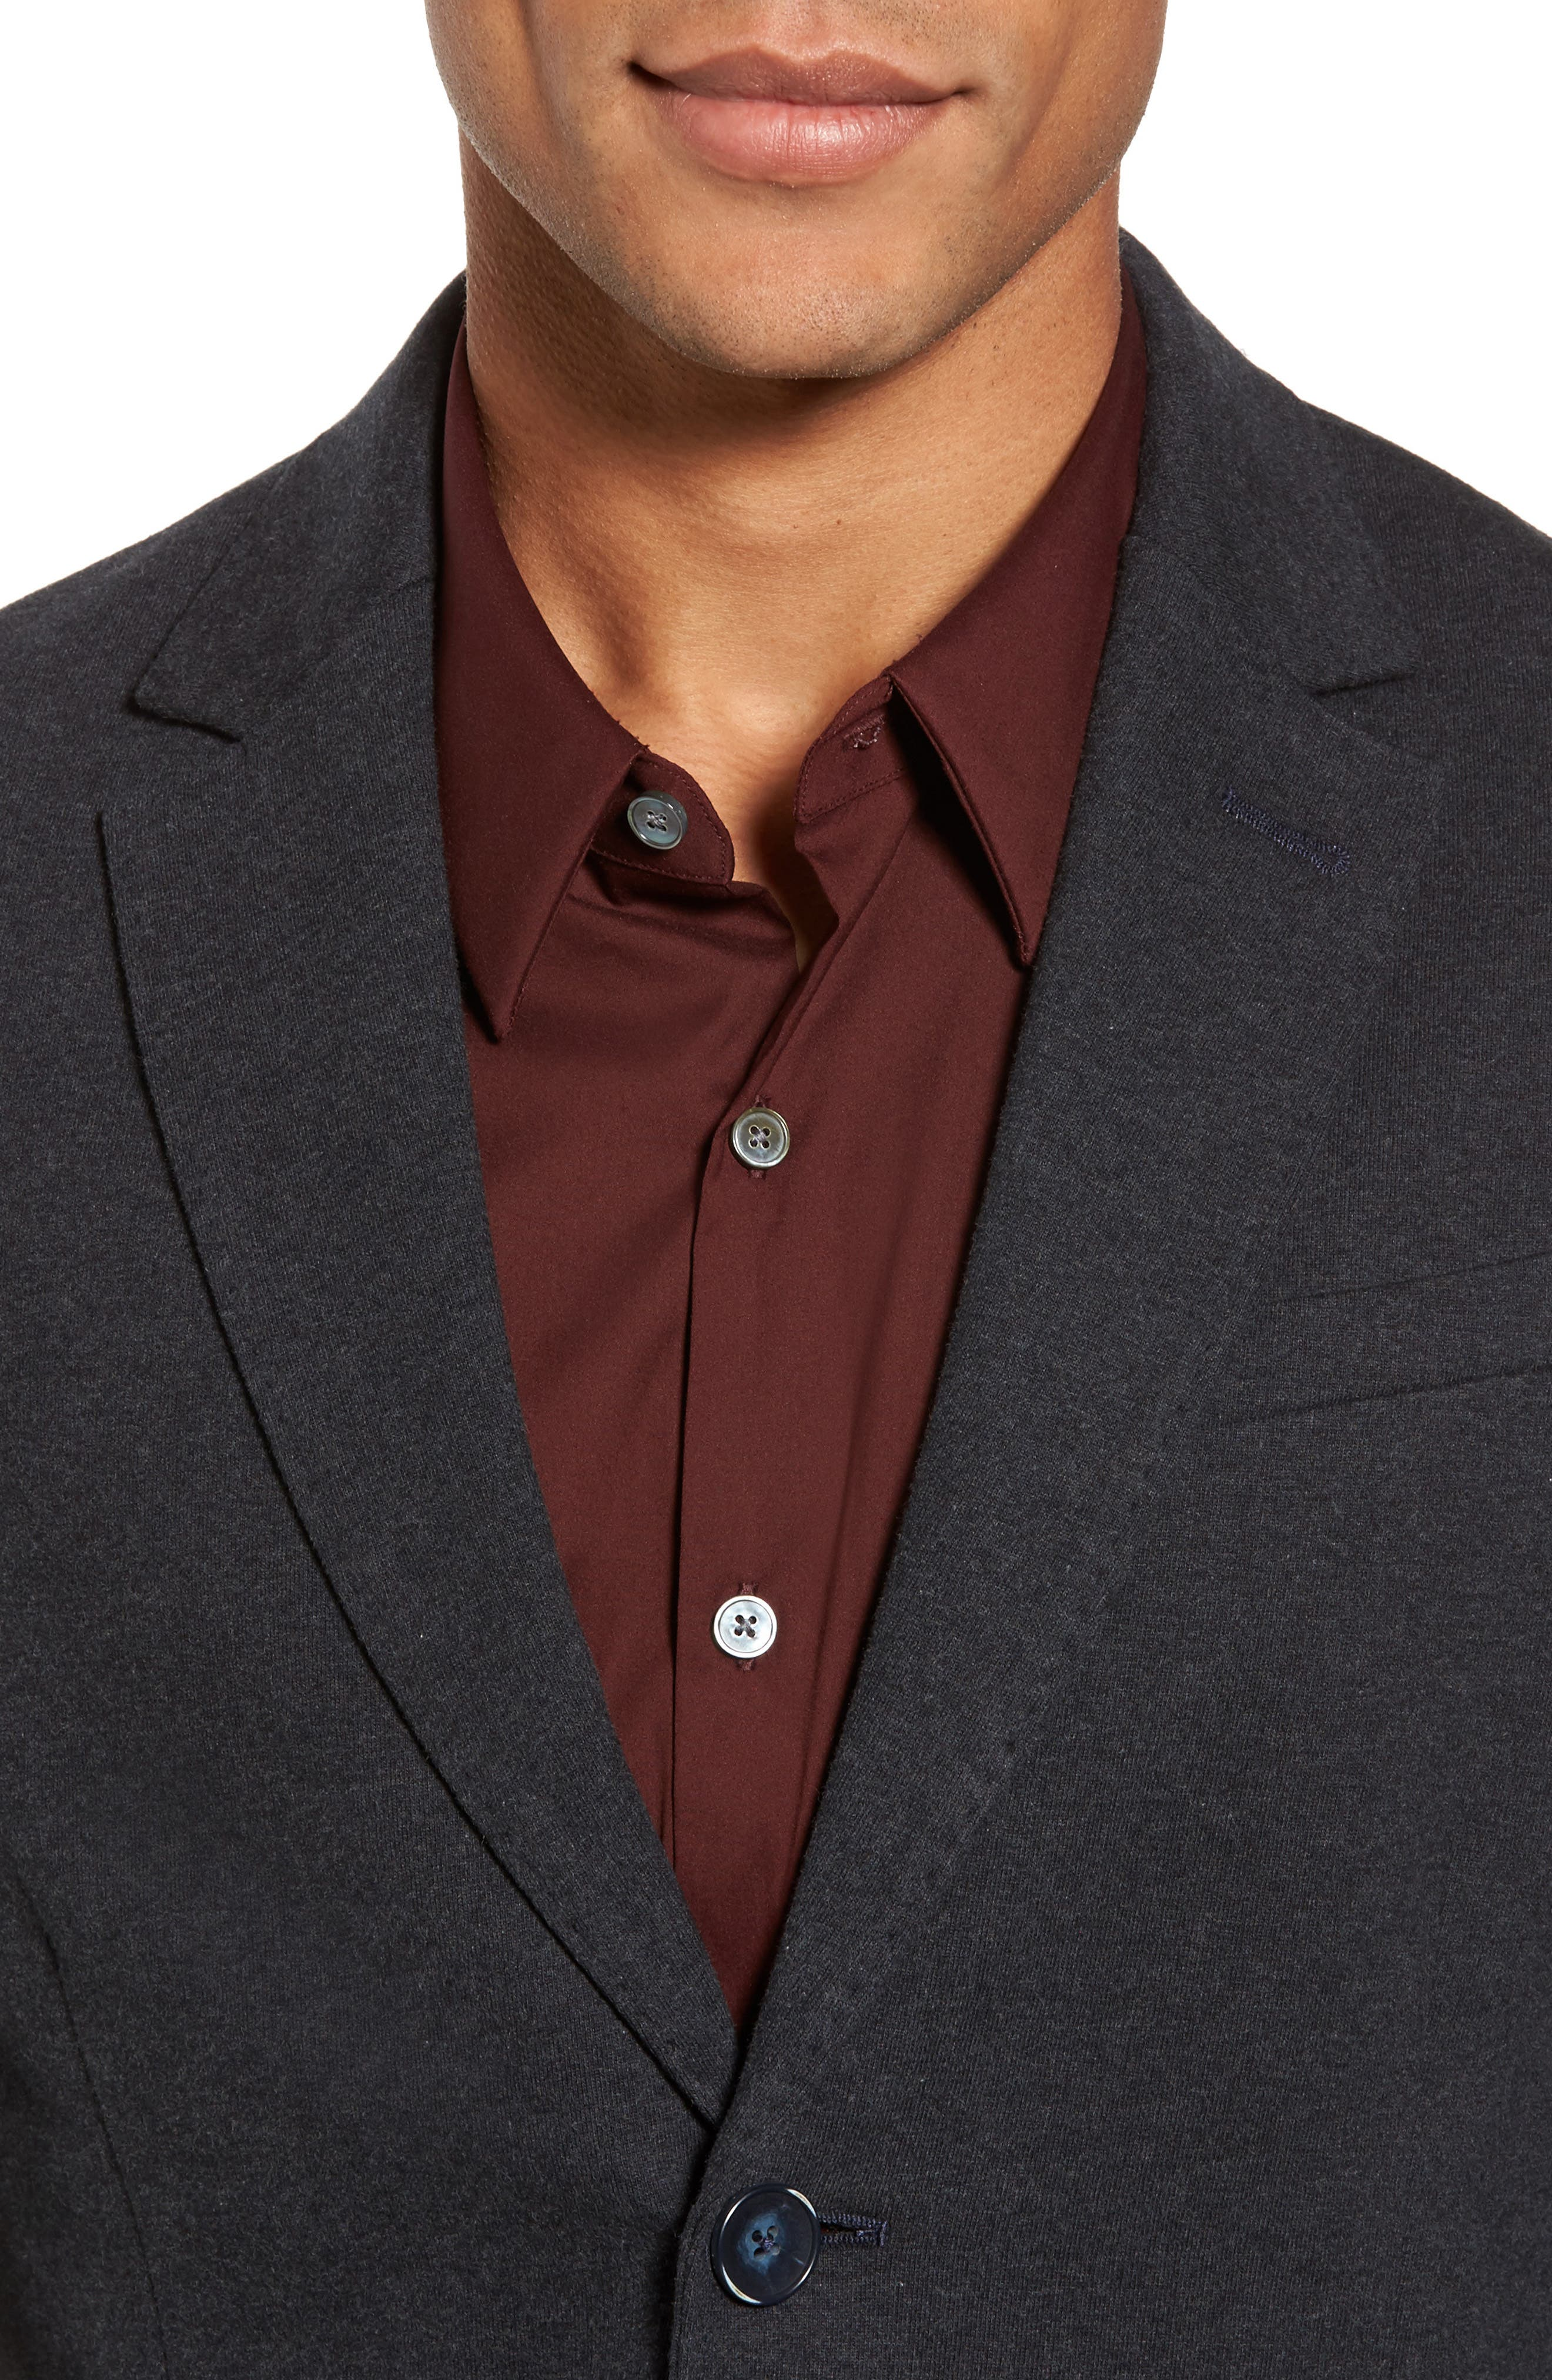 Tailored Jersey Jacket,                             Alternate thumbnail 4, color,                             Heather Dark Navy